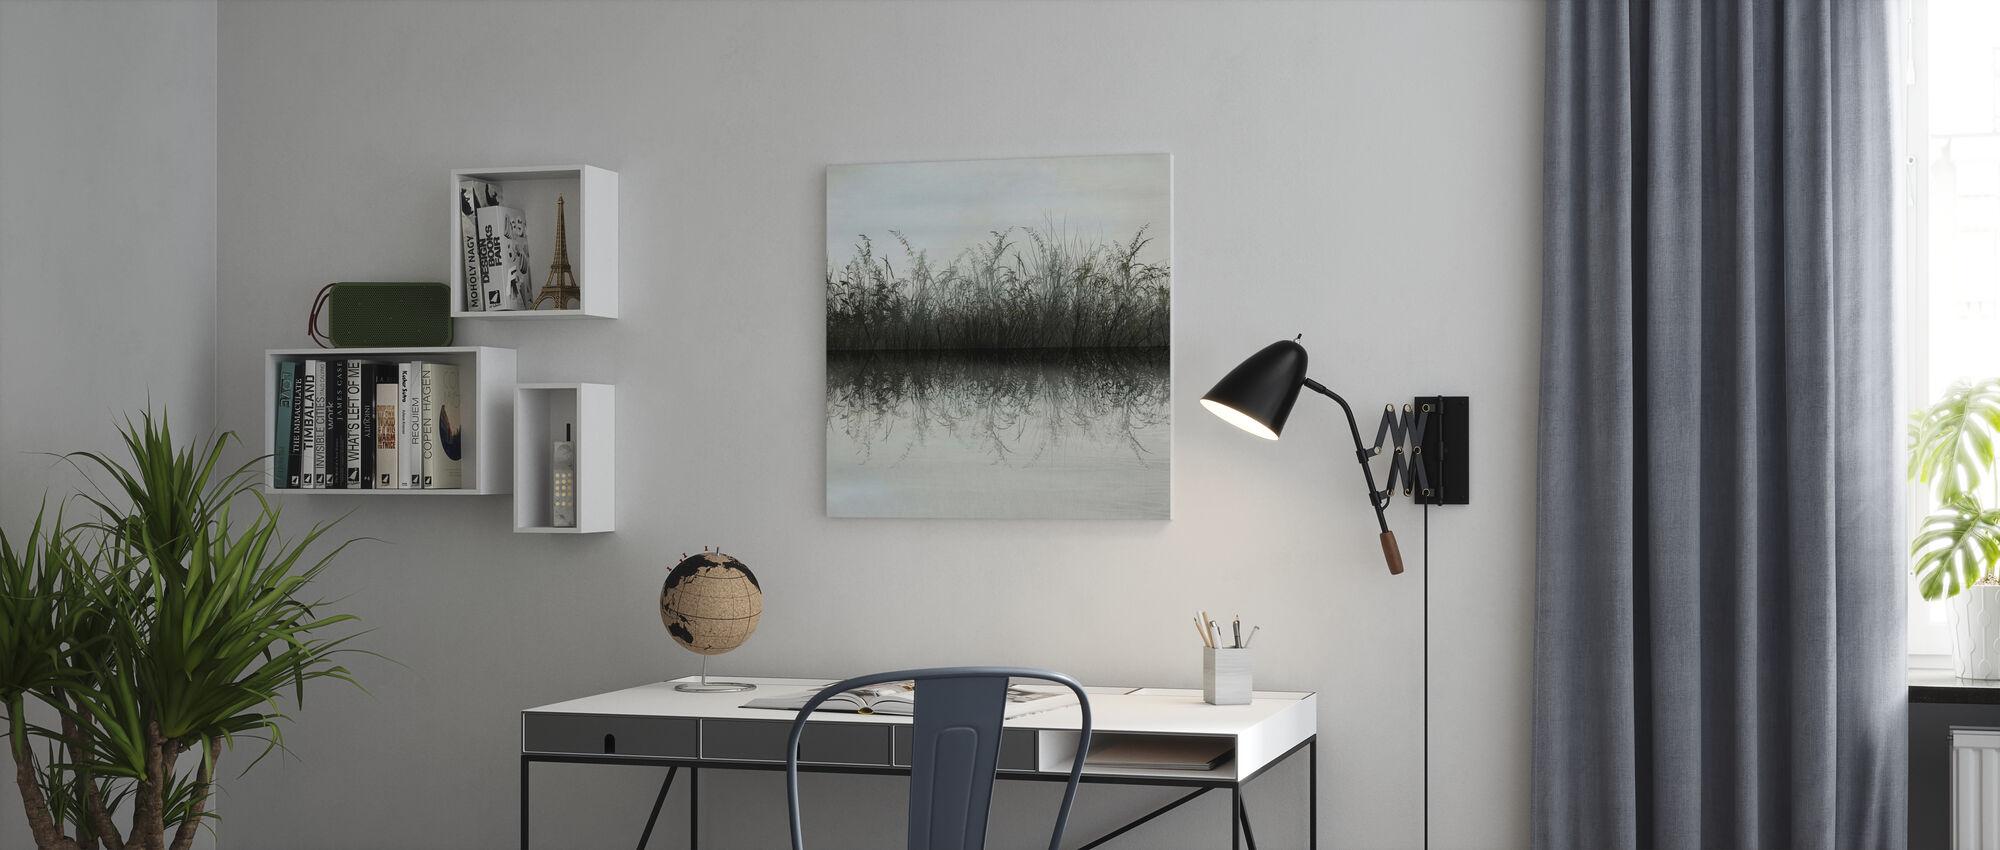 Gräs Vatten Reflektion - Canvastavla - Kontor